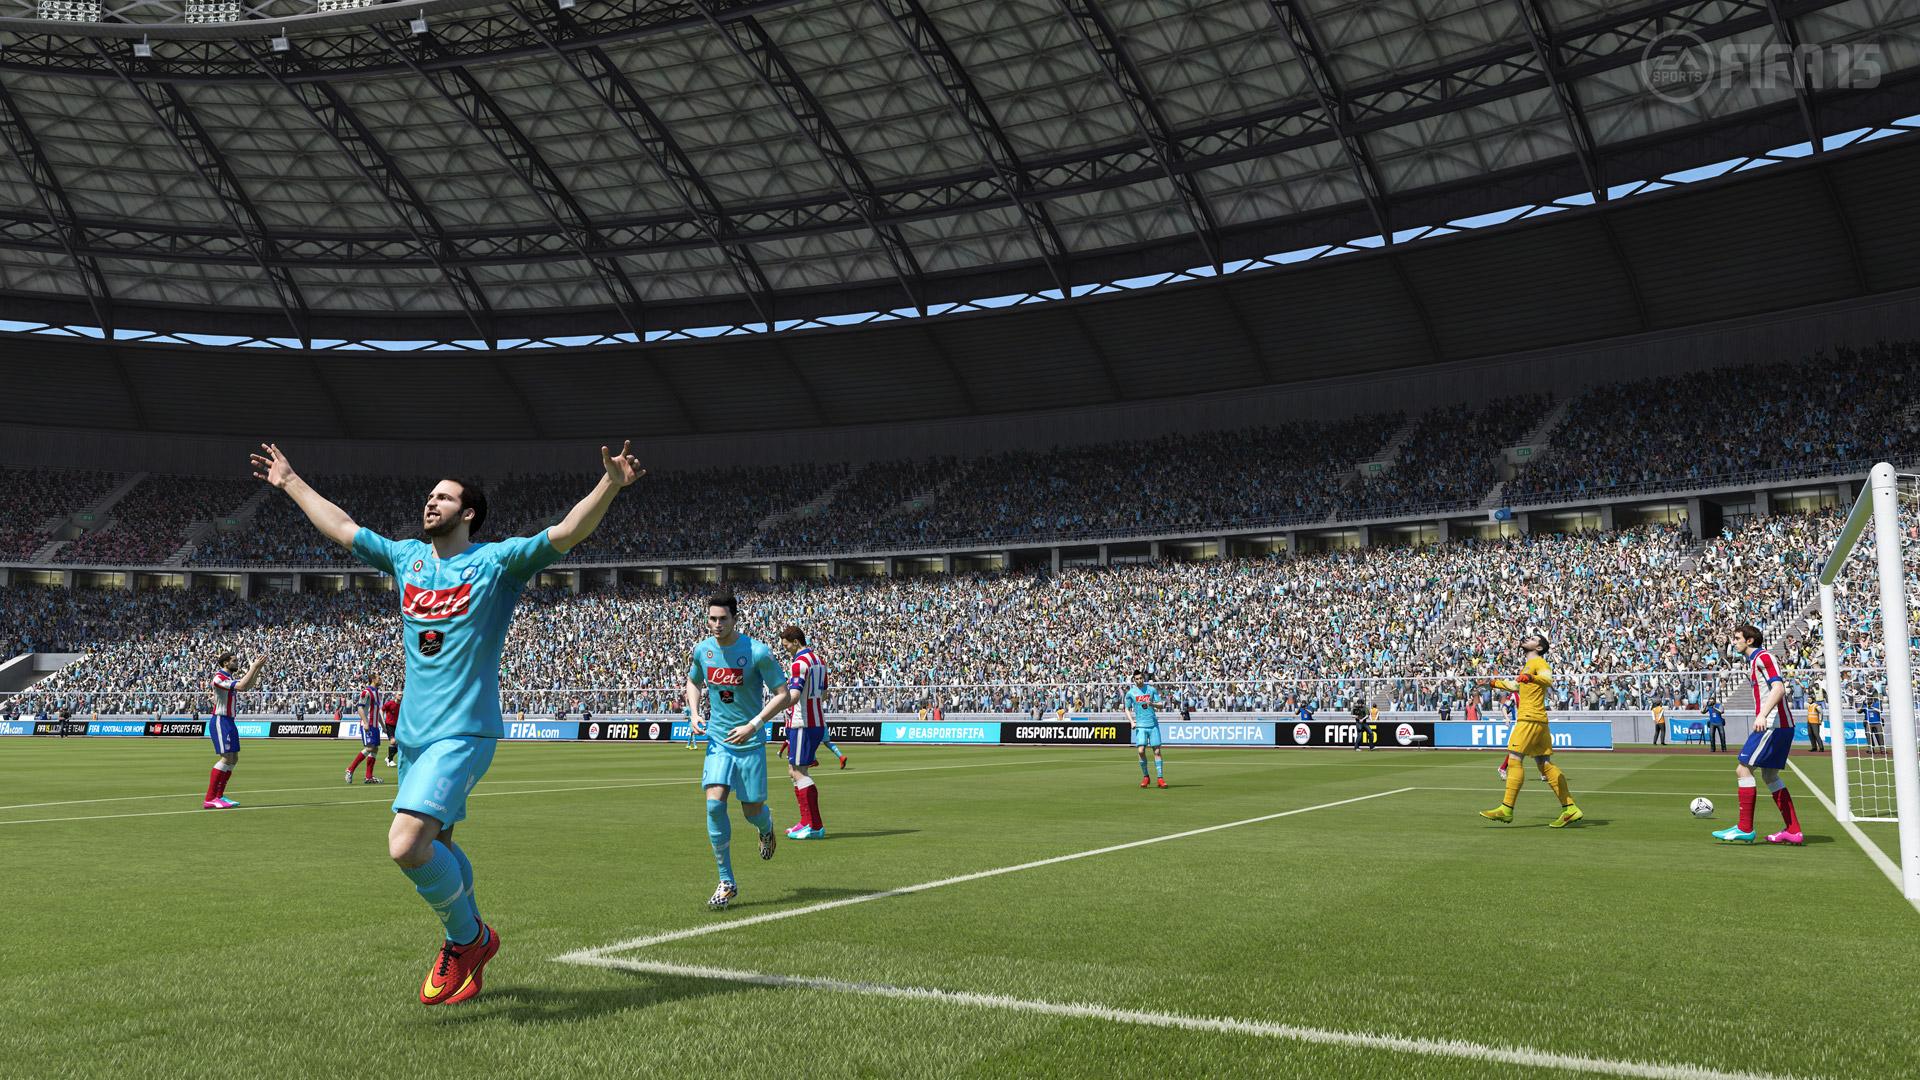 Free FIFA 15 Wallpaper in 1920x1080